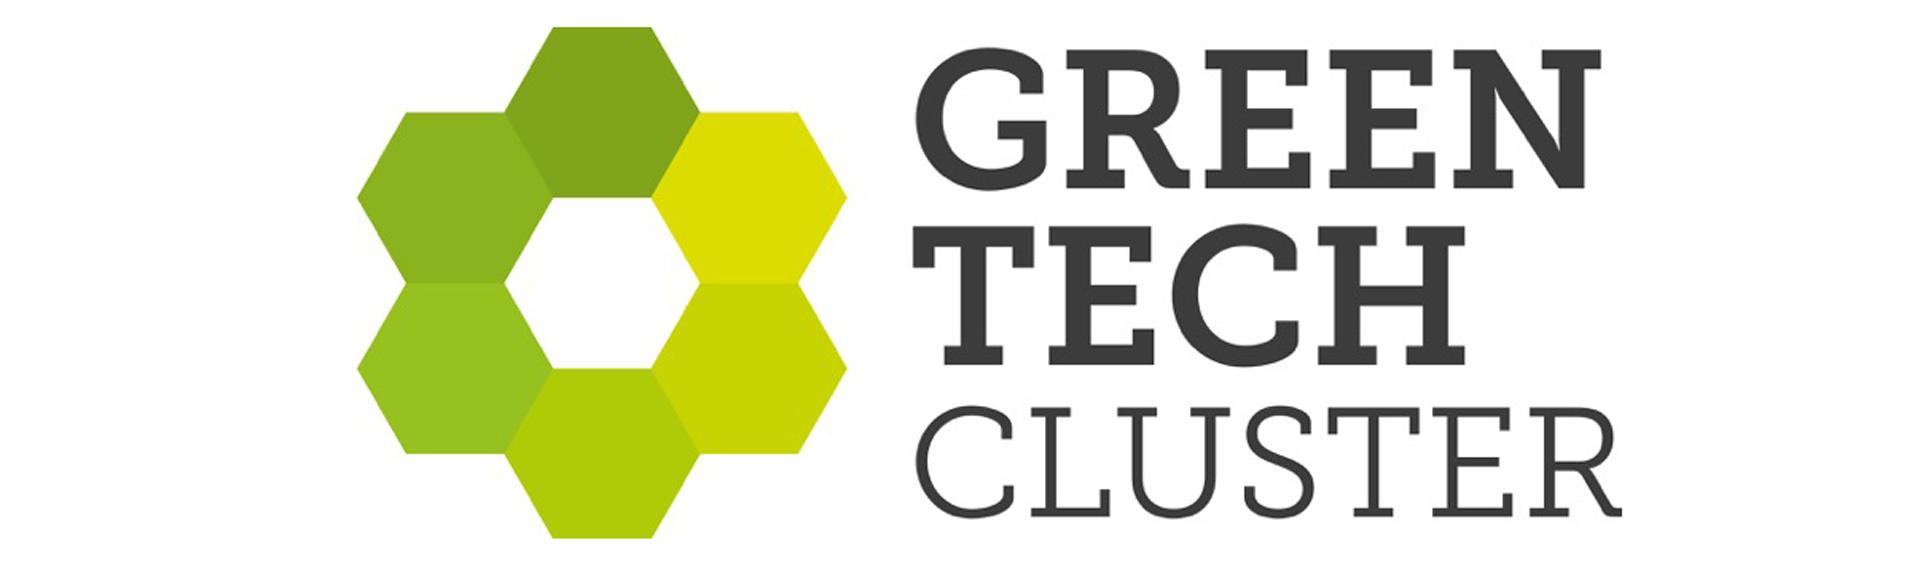 Know-Center ist Partner des Green Tech Cluster